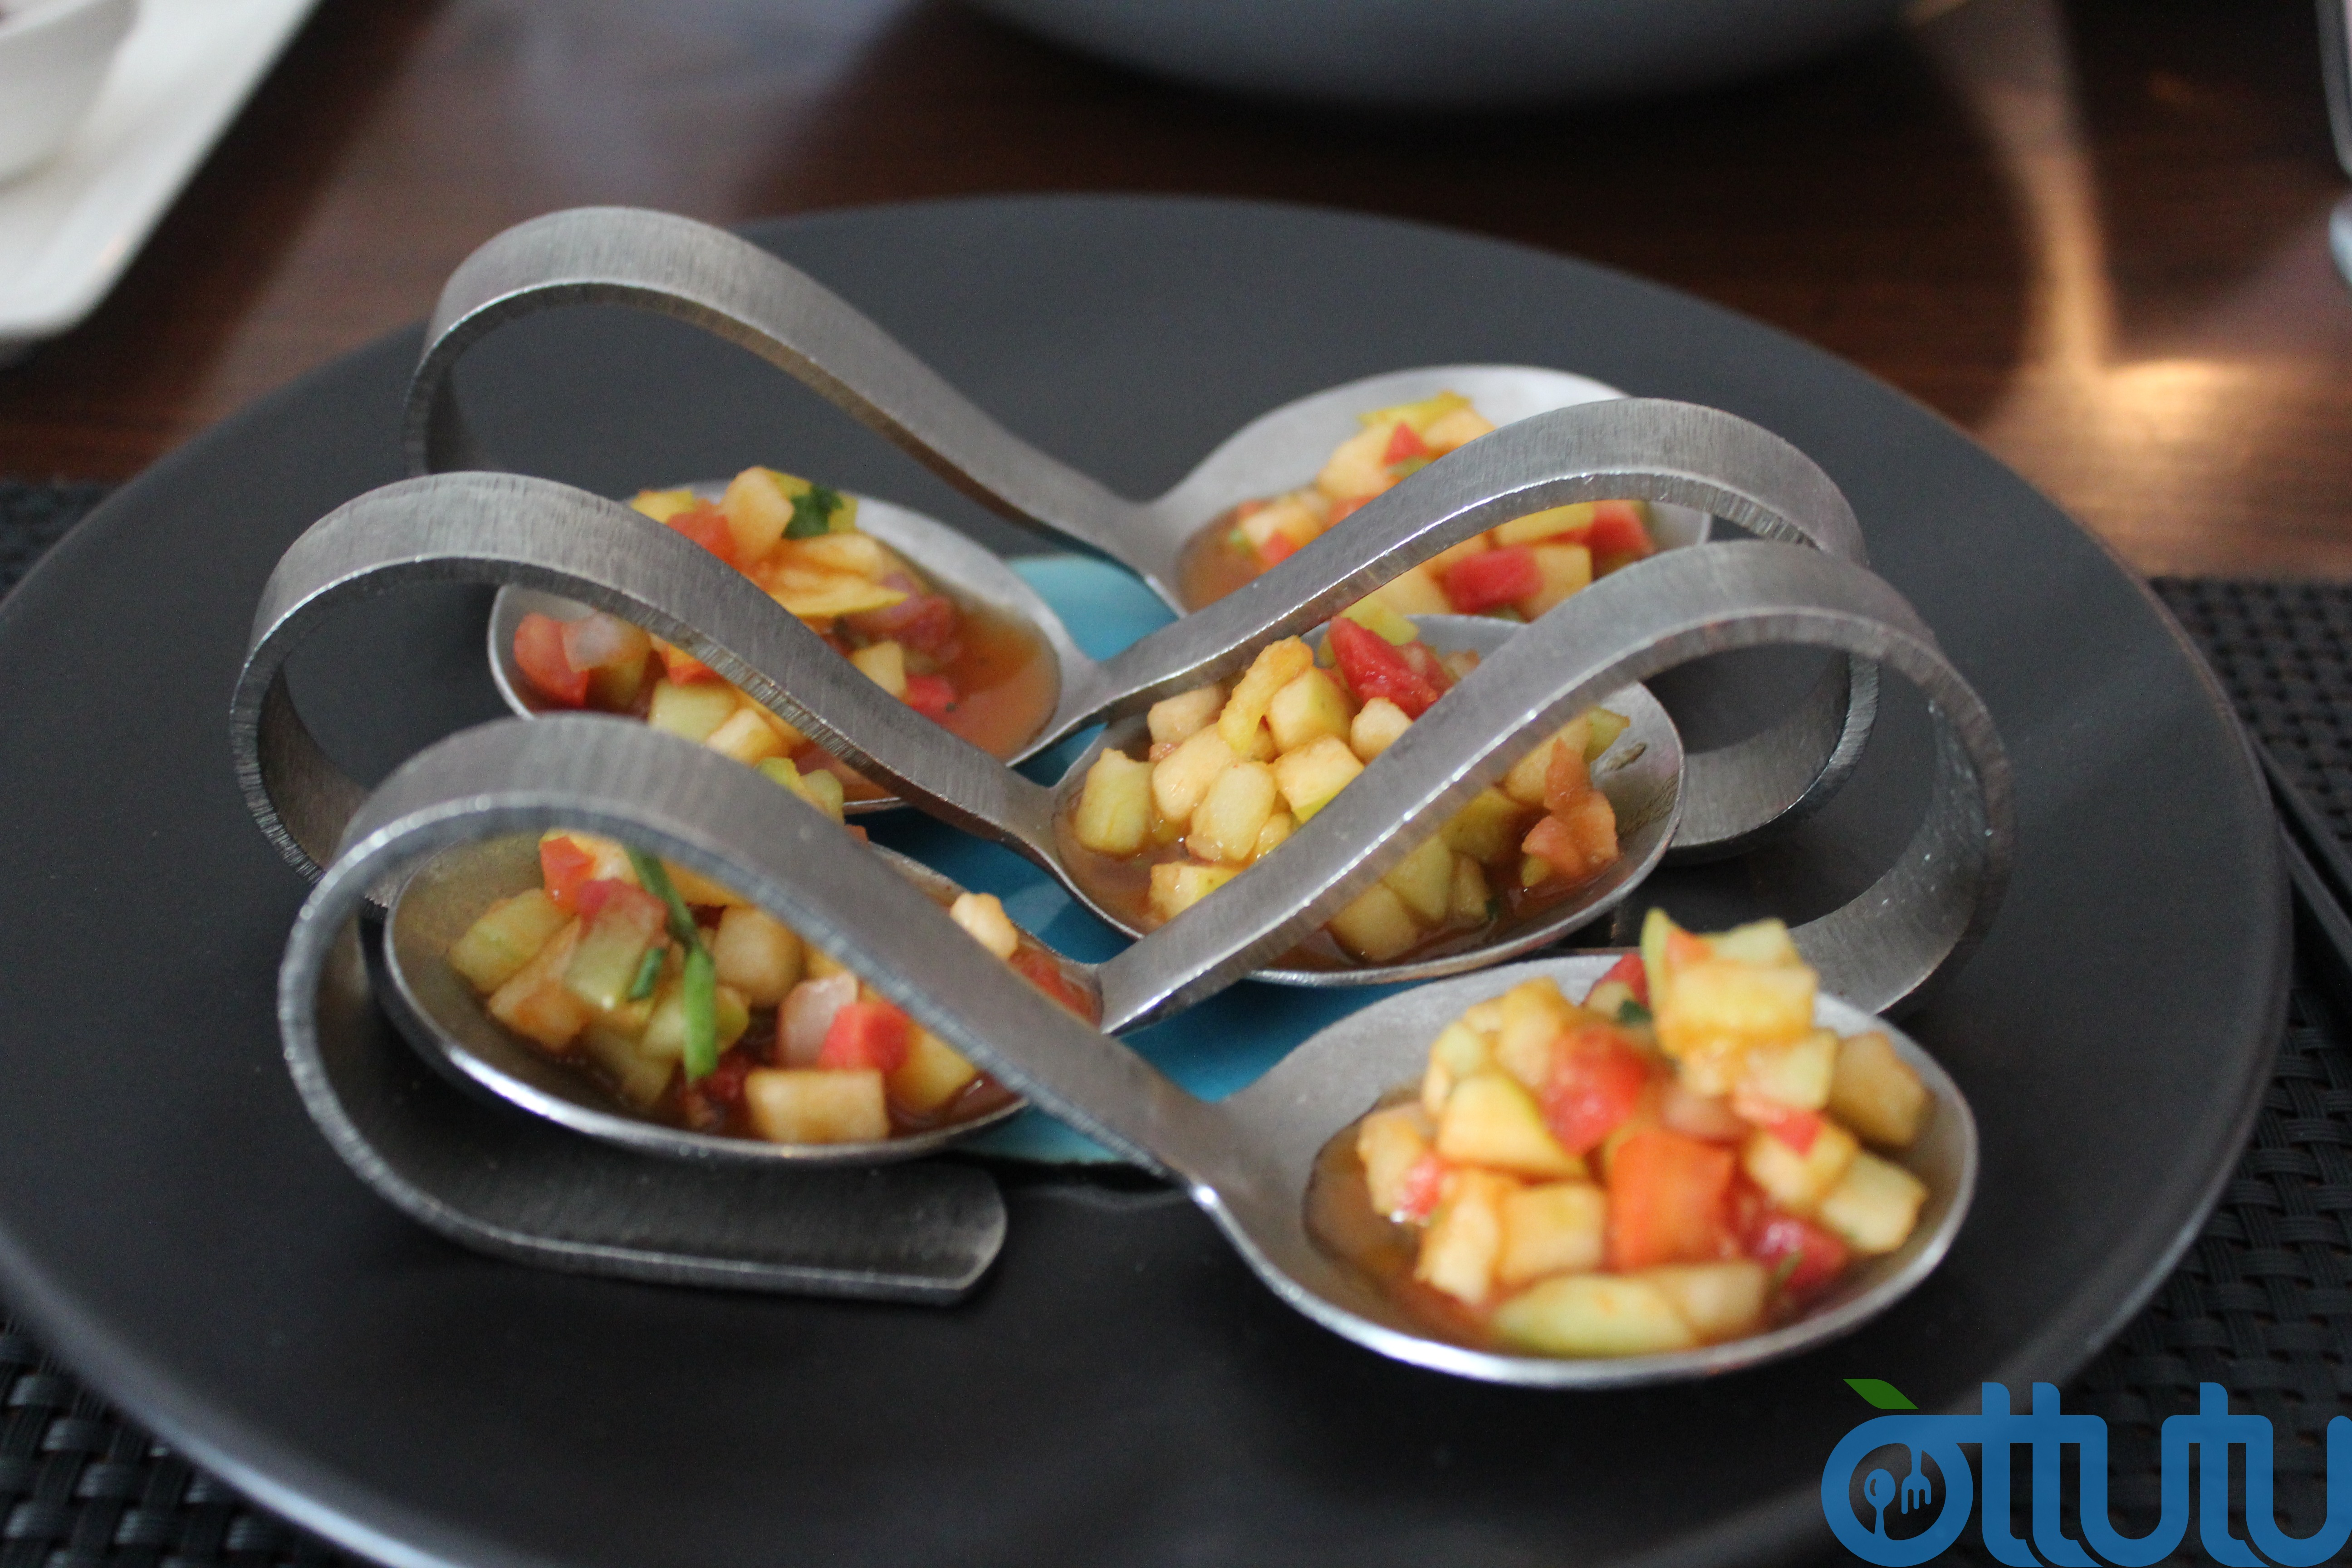 Fuchsia Kitchen Complimentary Salad